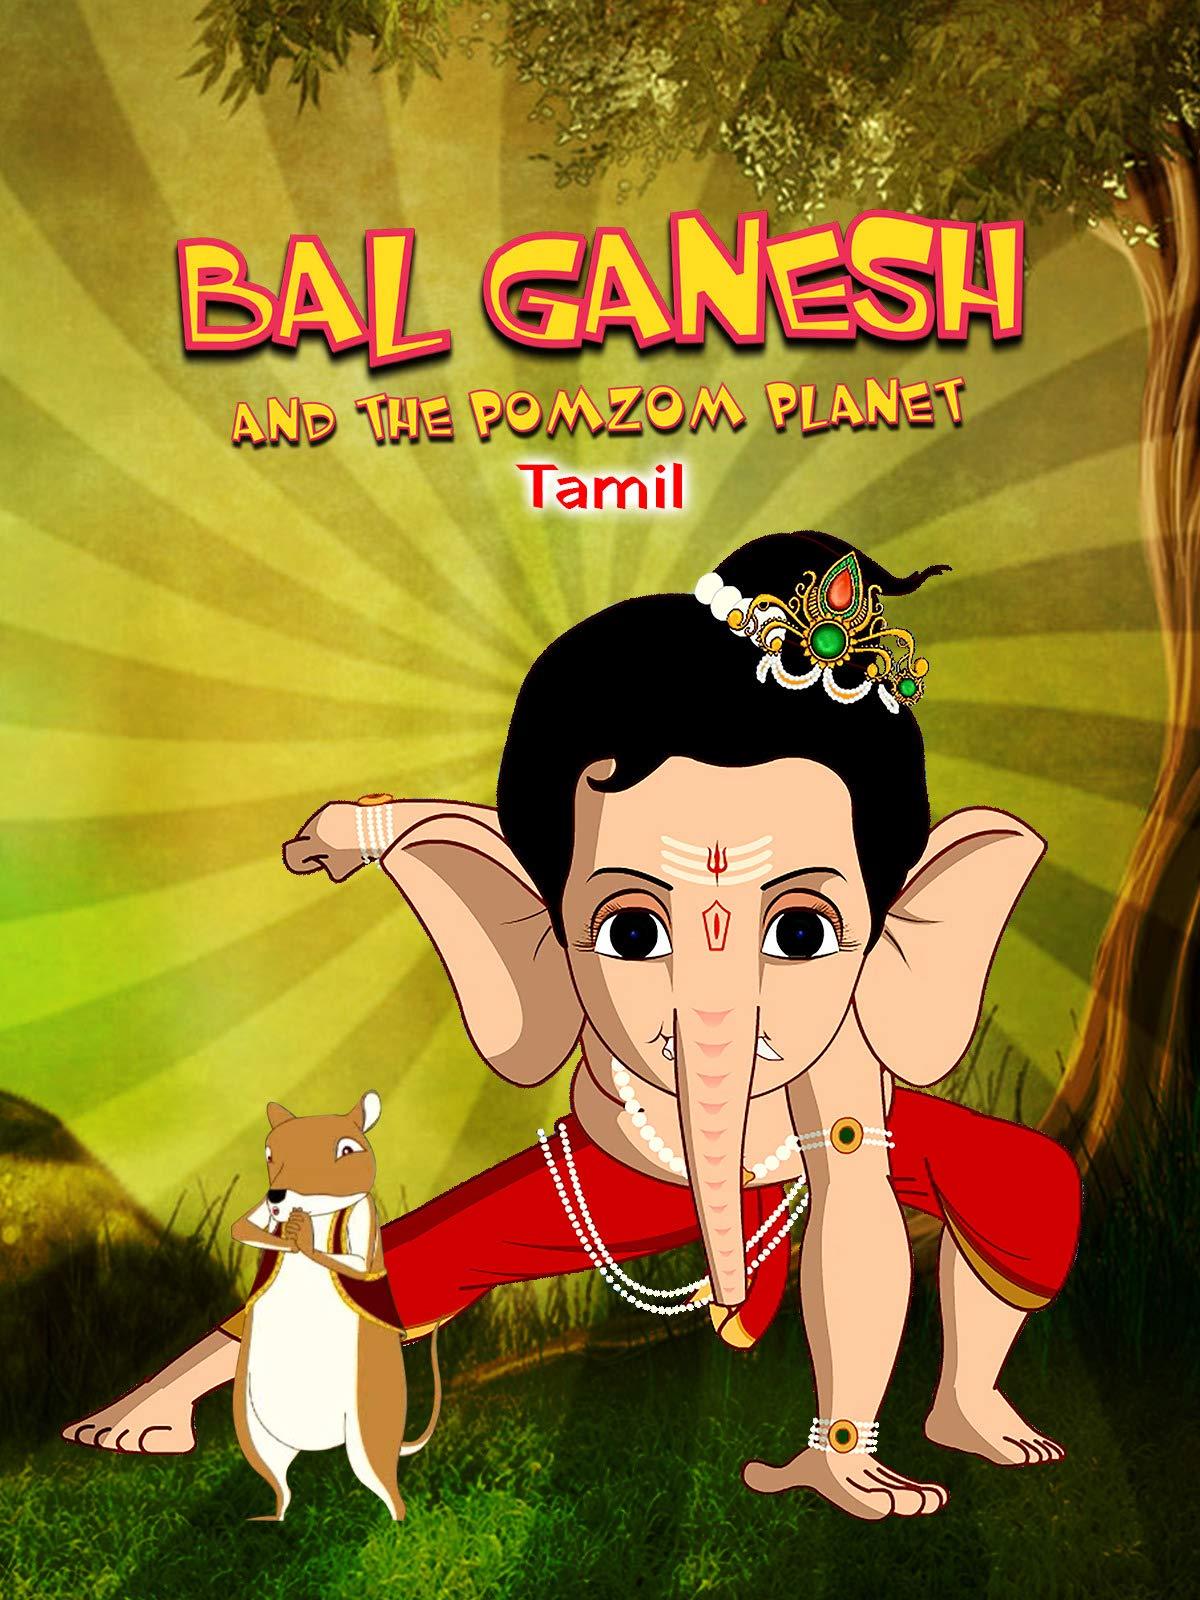 Bal Ganesh and PomZom Planet (Tamil)